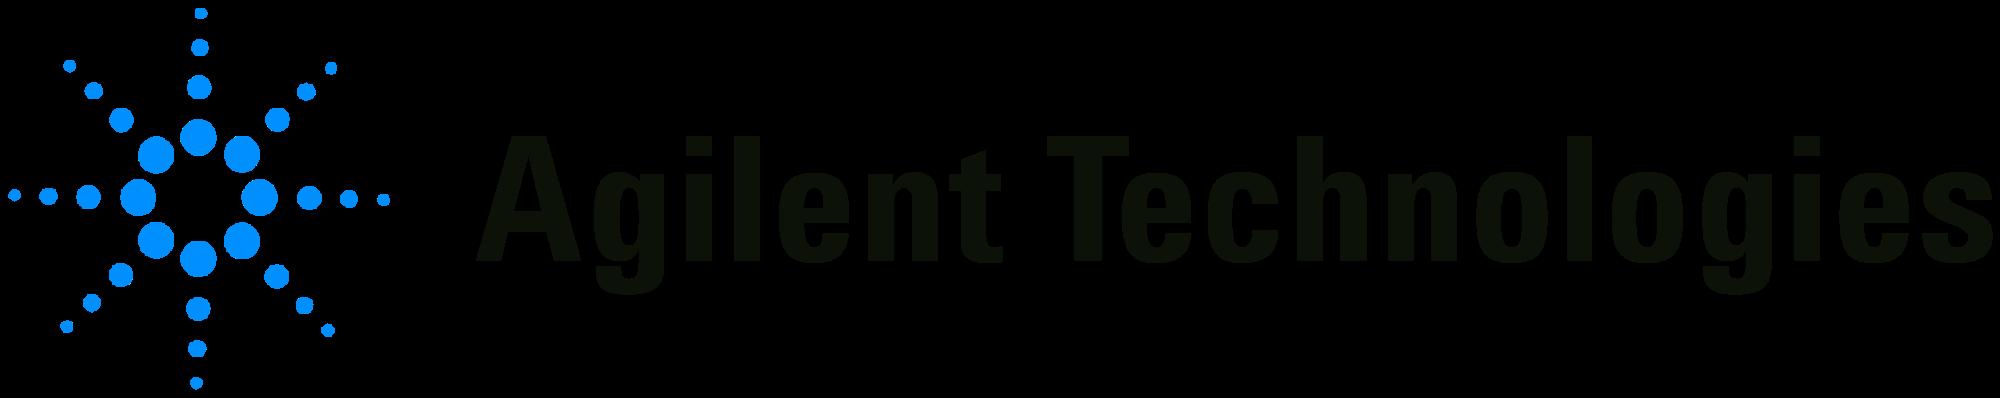 partner_logo_agilent_technologies